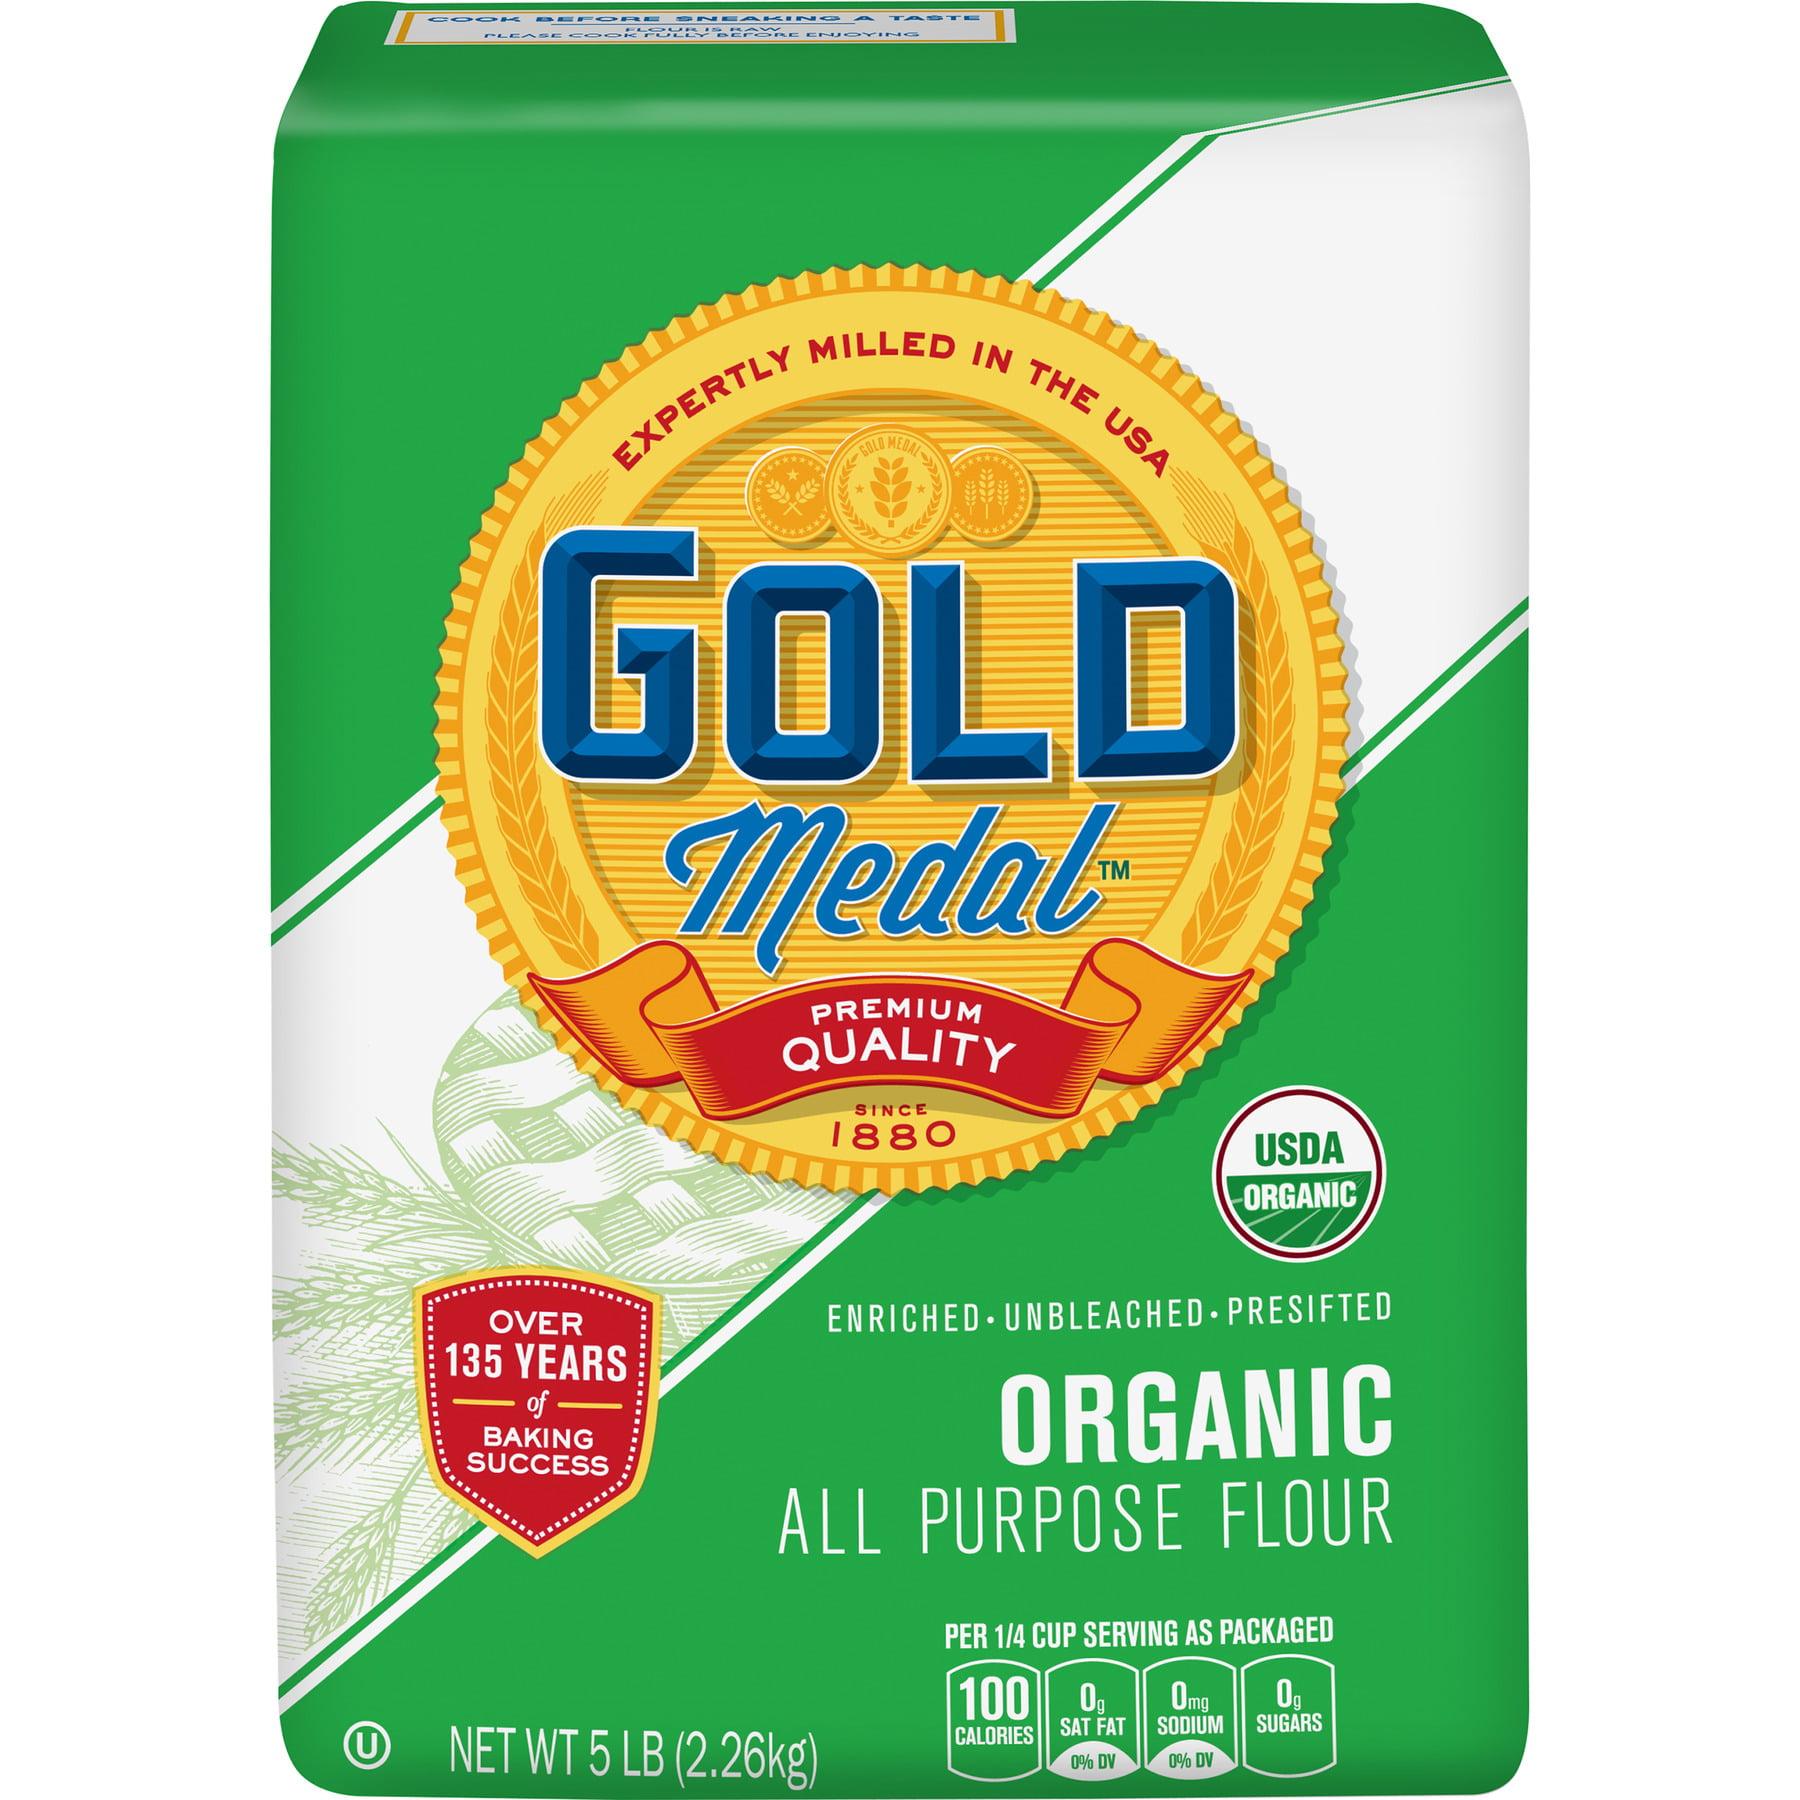 Gold Medal Organic All-Purpose Flour, 5 lb Bag